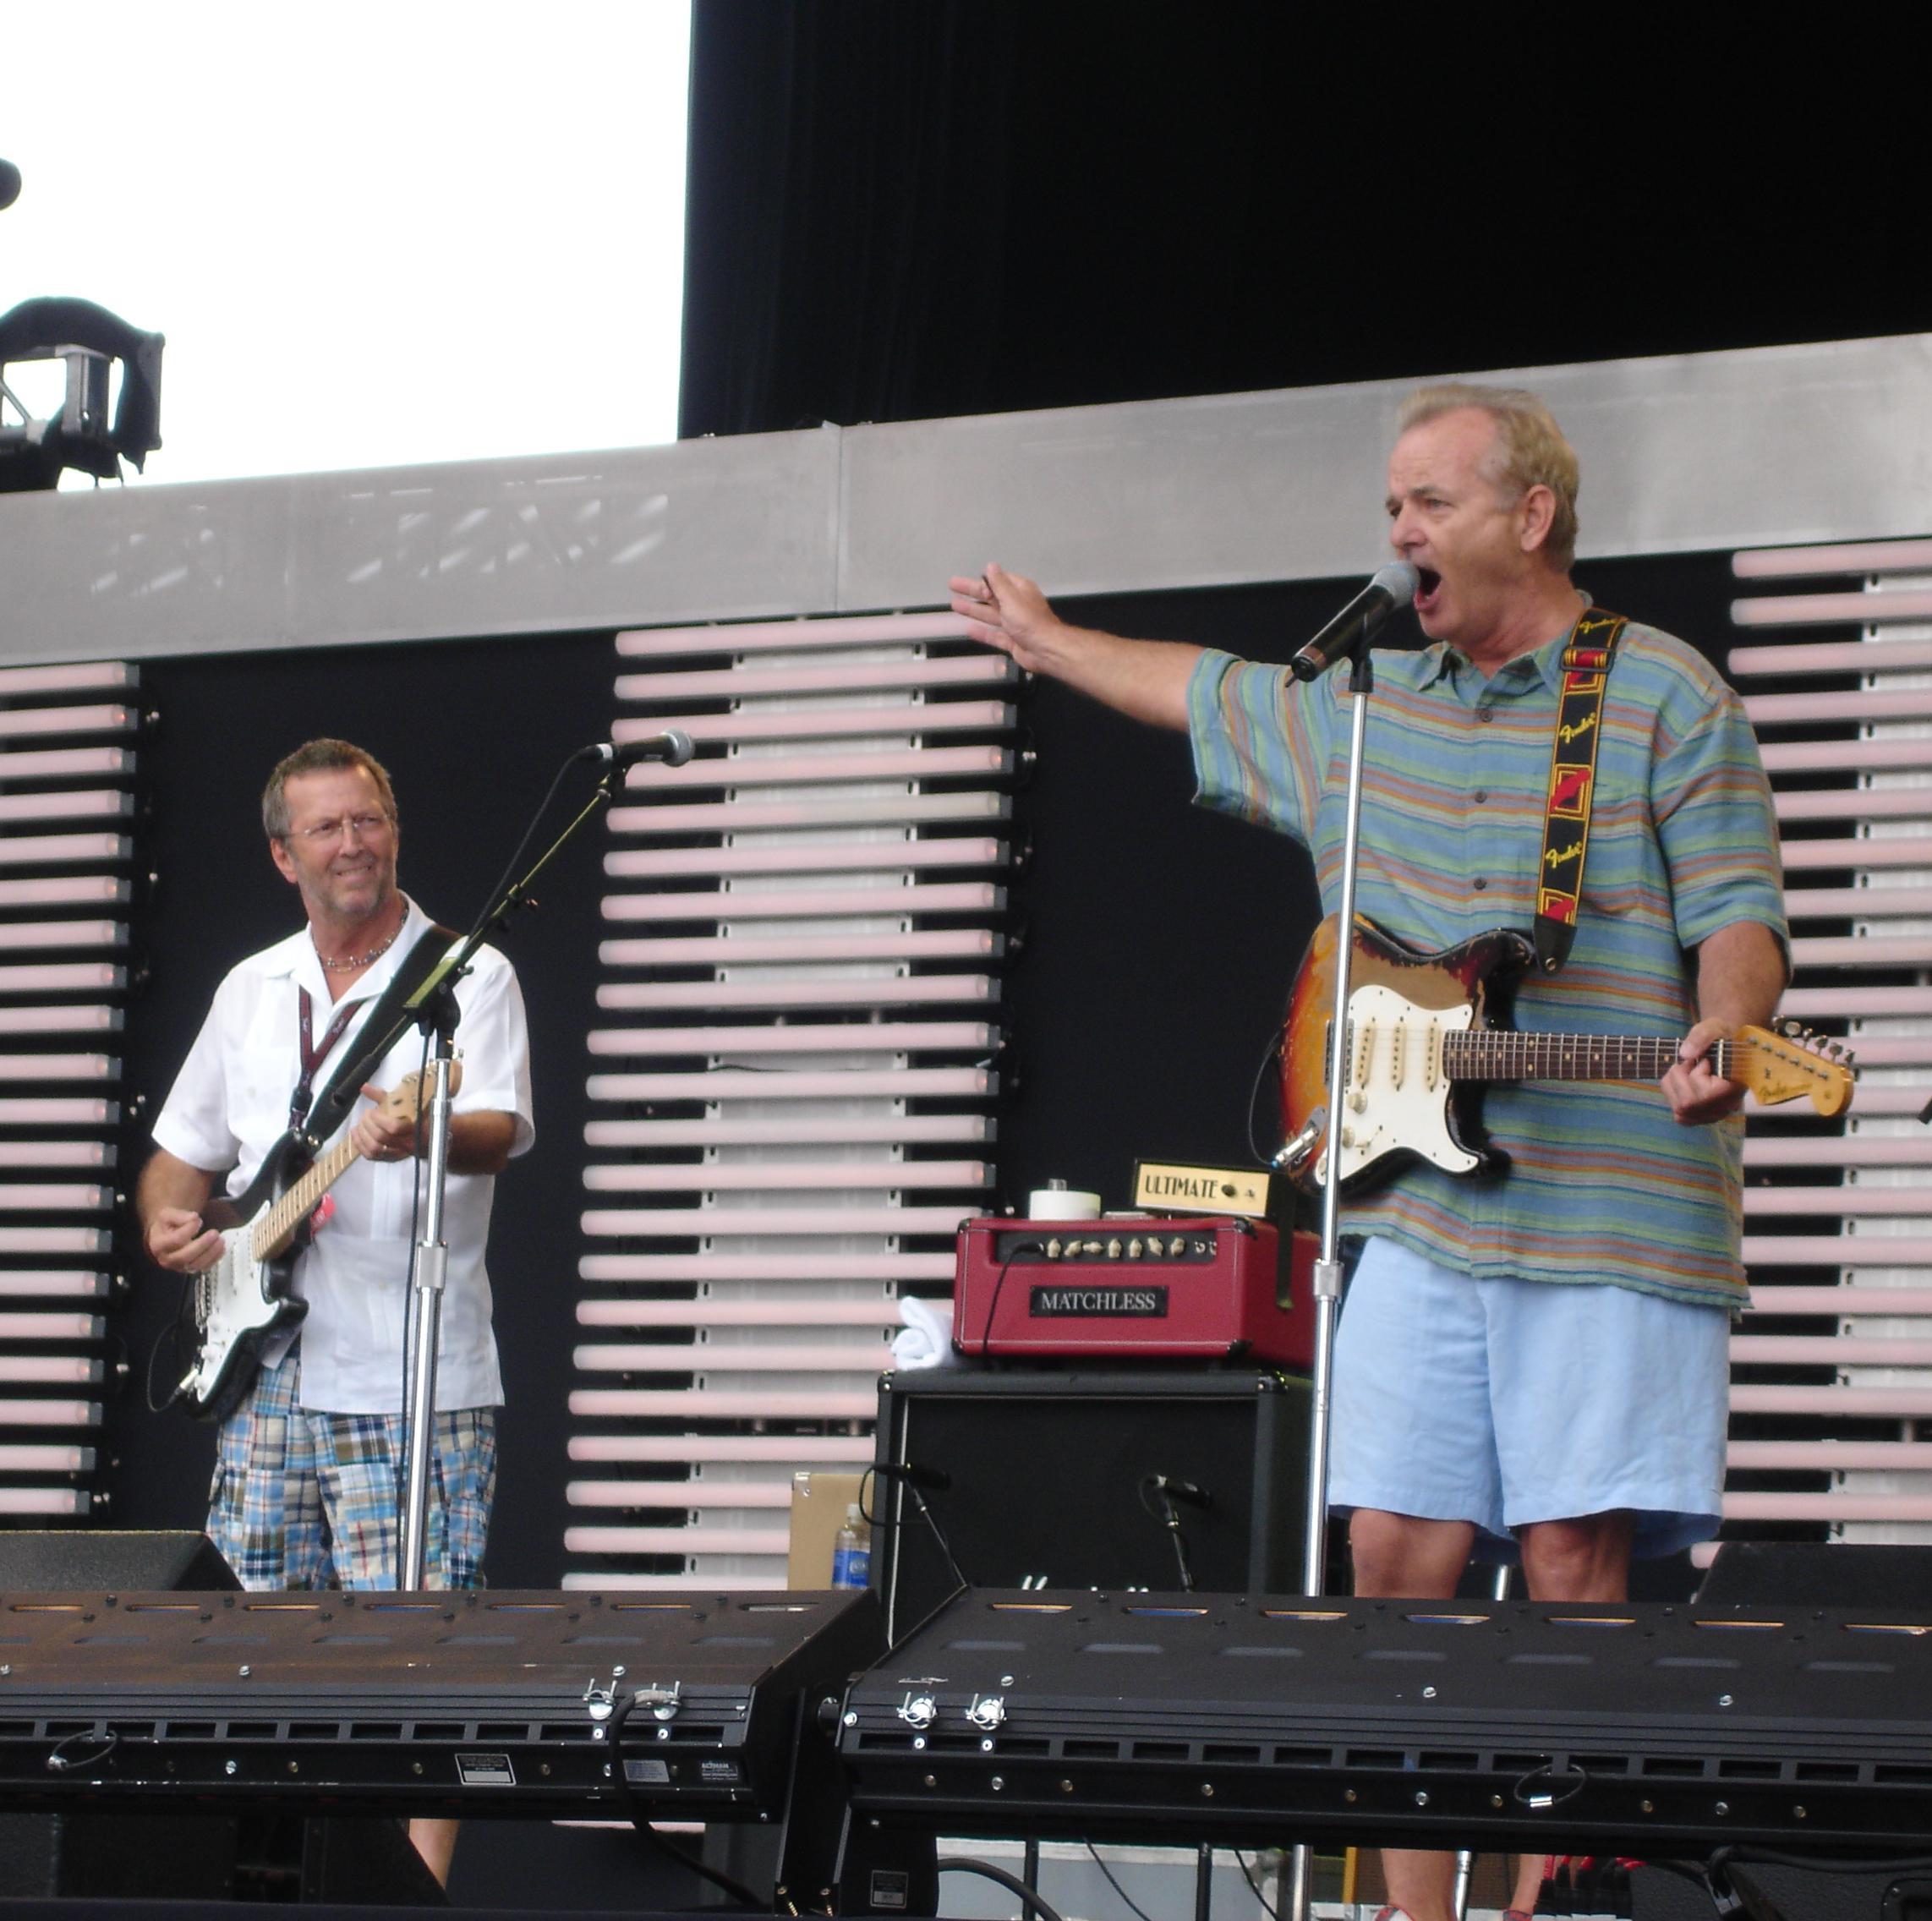 Eric Clapton Crossroads Guitar Festival 2020.Crossroads Guitar Festival Wikipedia